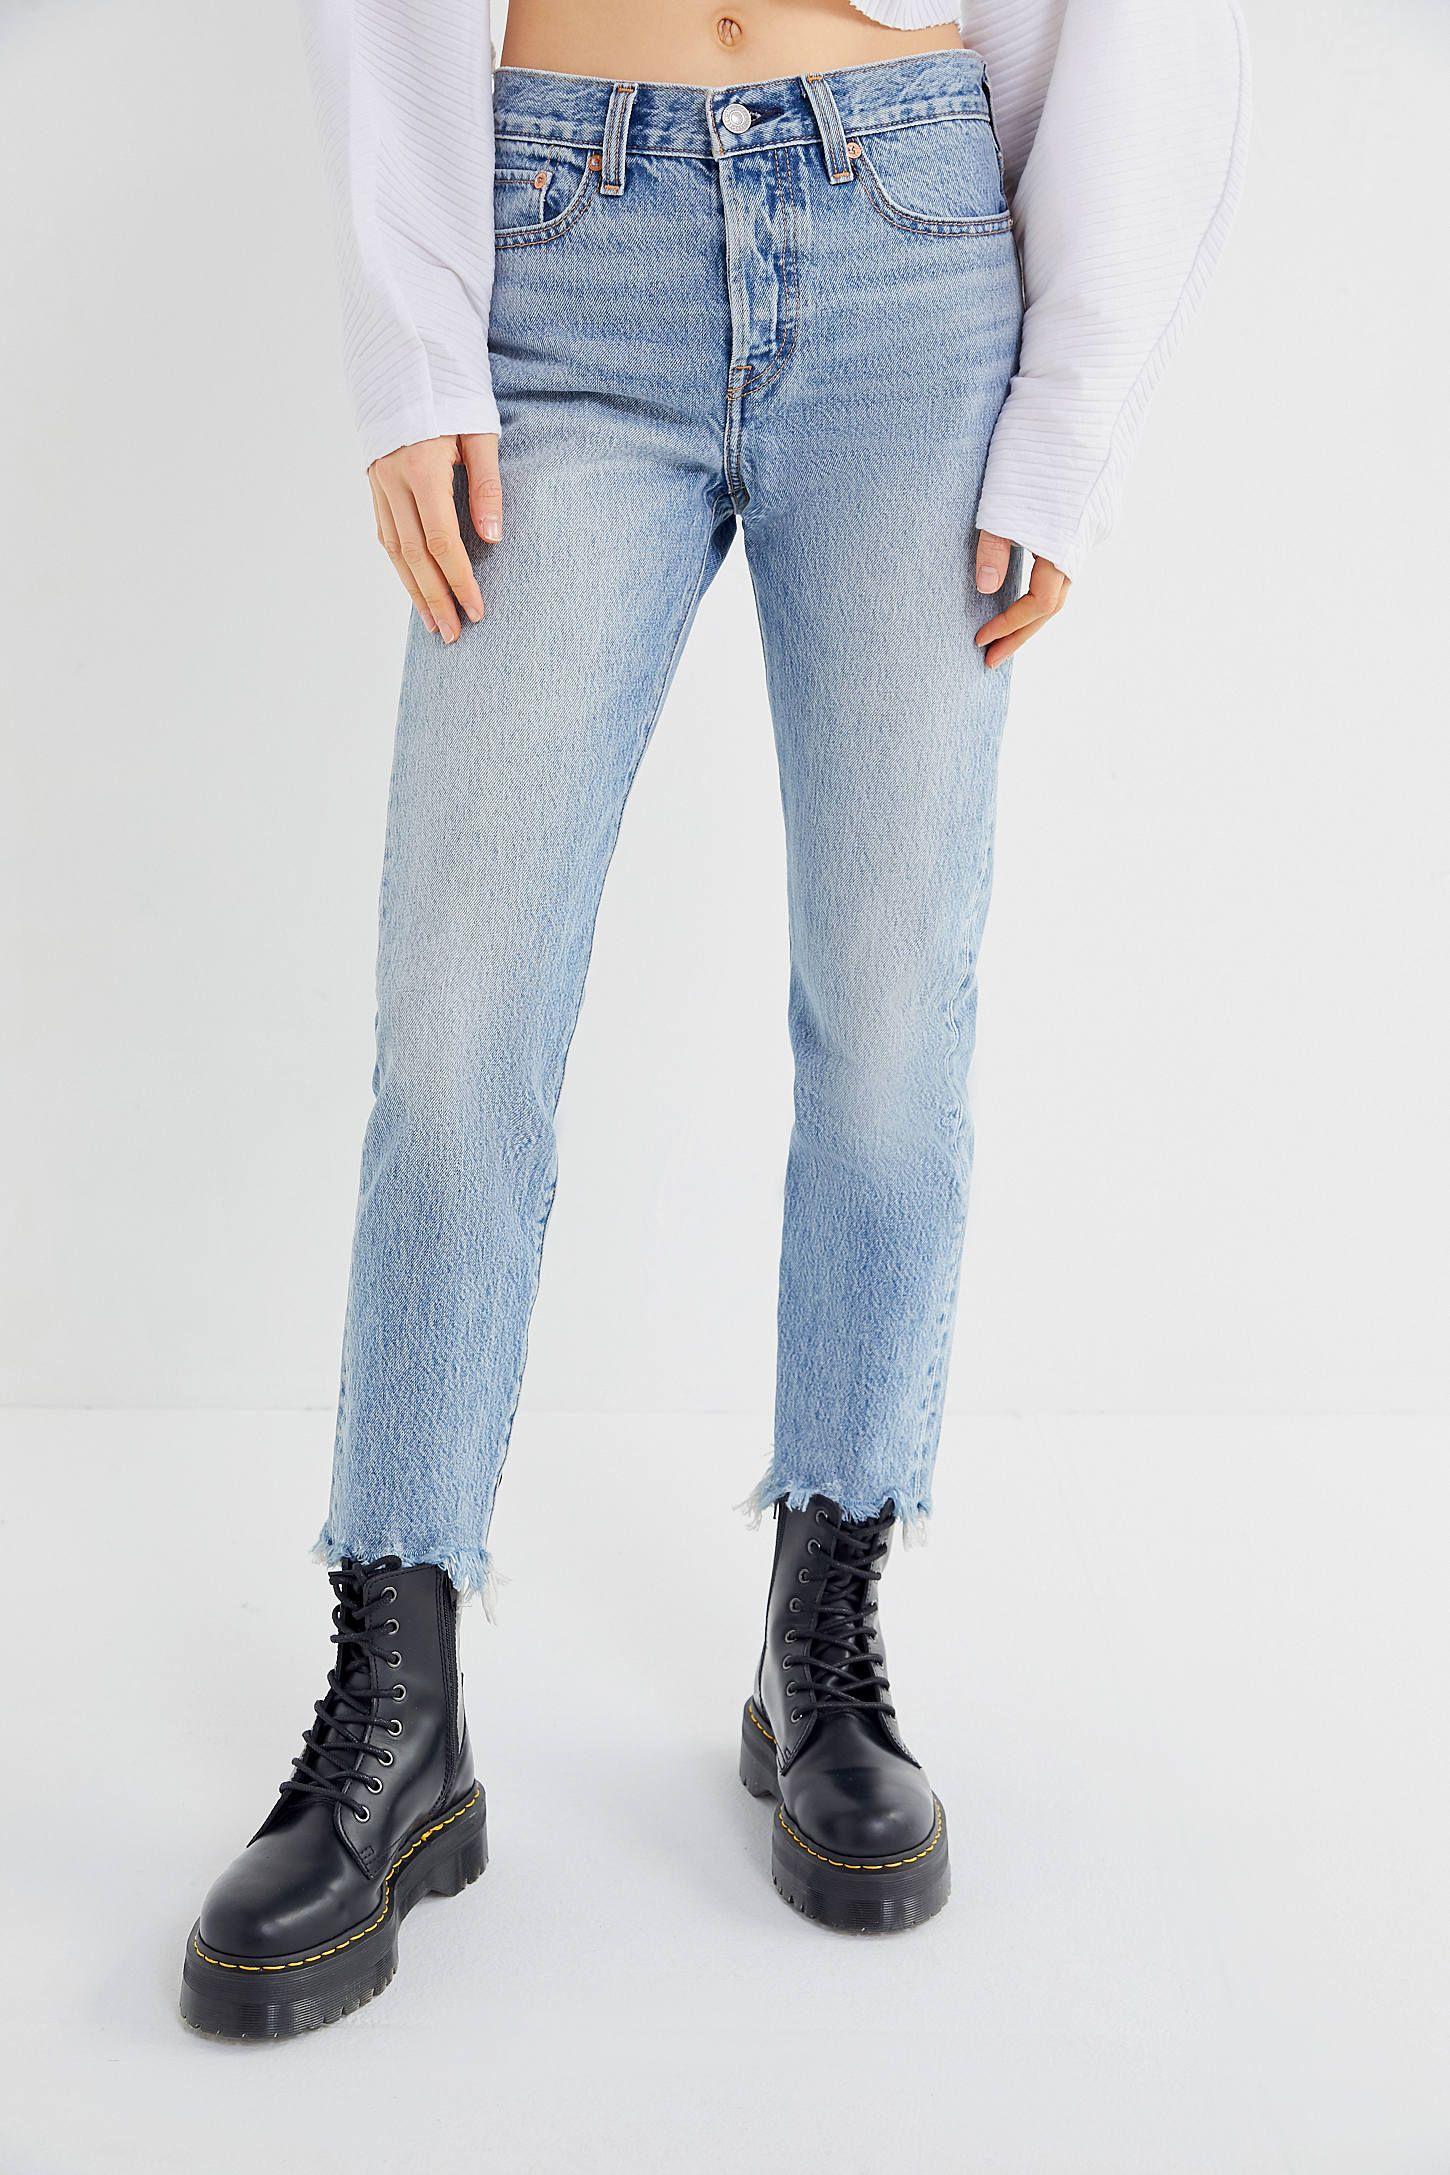 3fdb82041a5 Levi s Wedgie High-Rise Jean – Shut Up in 2019